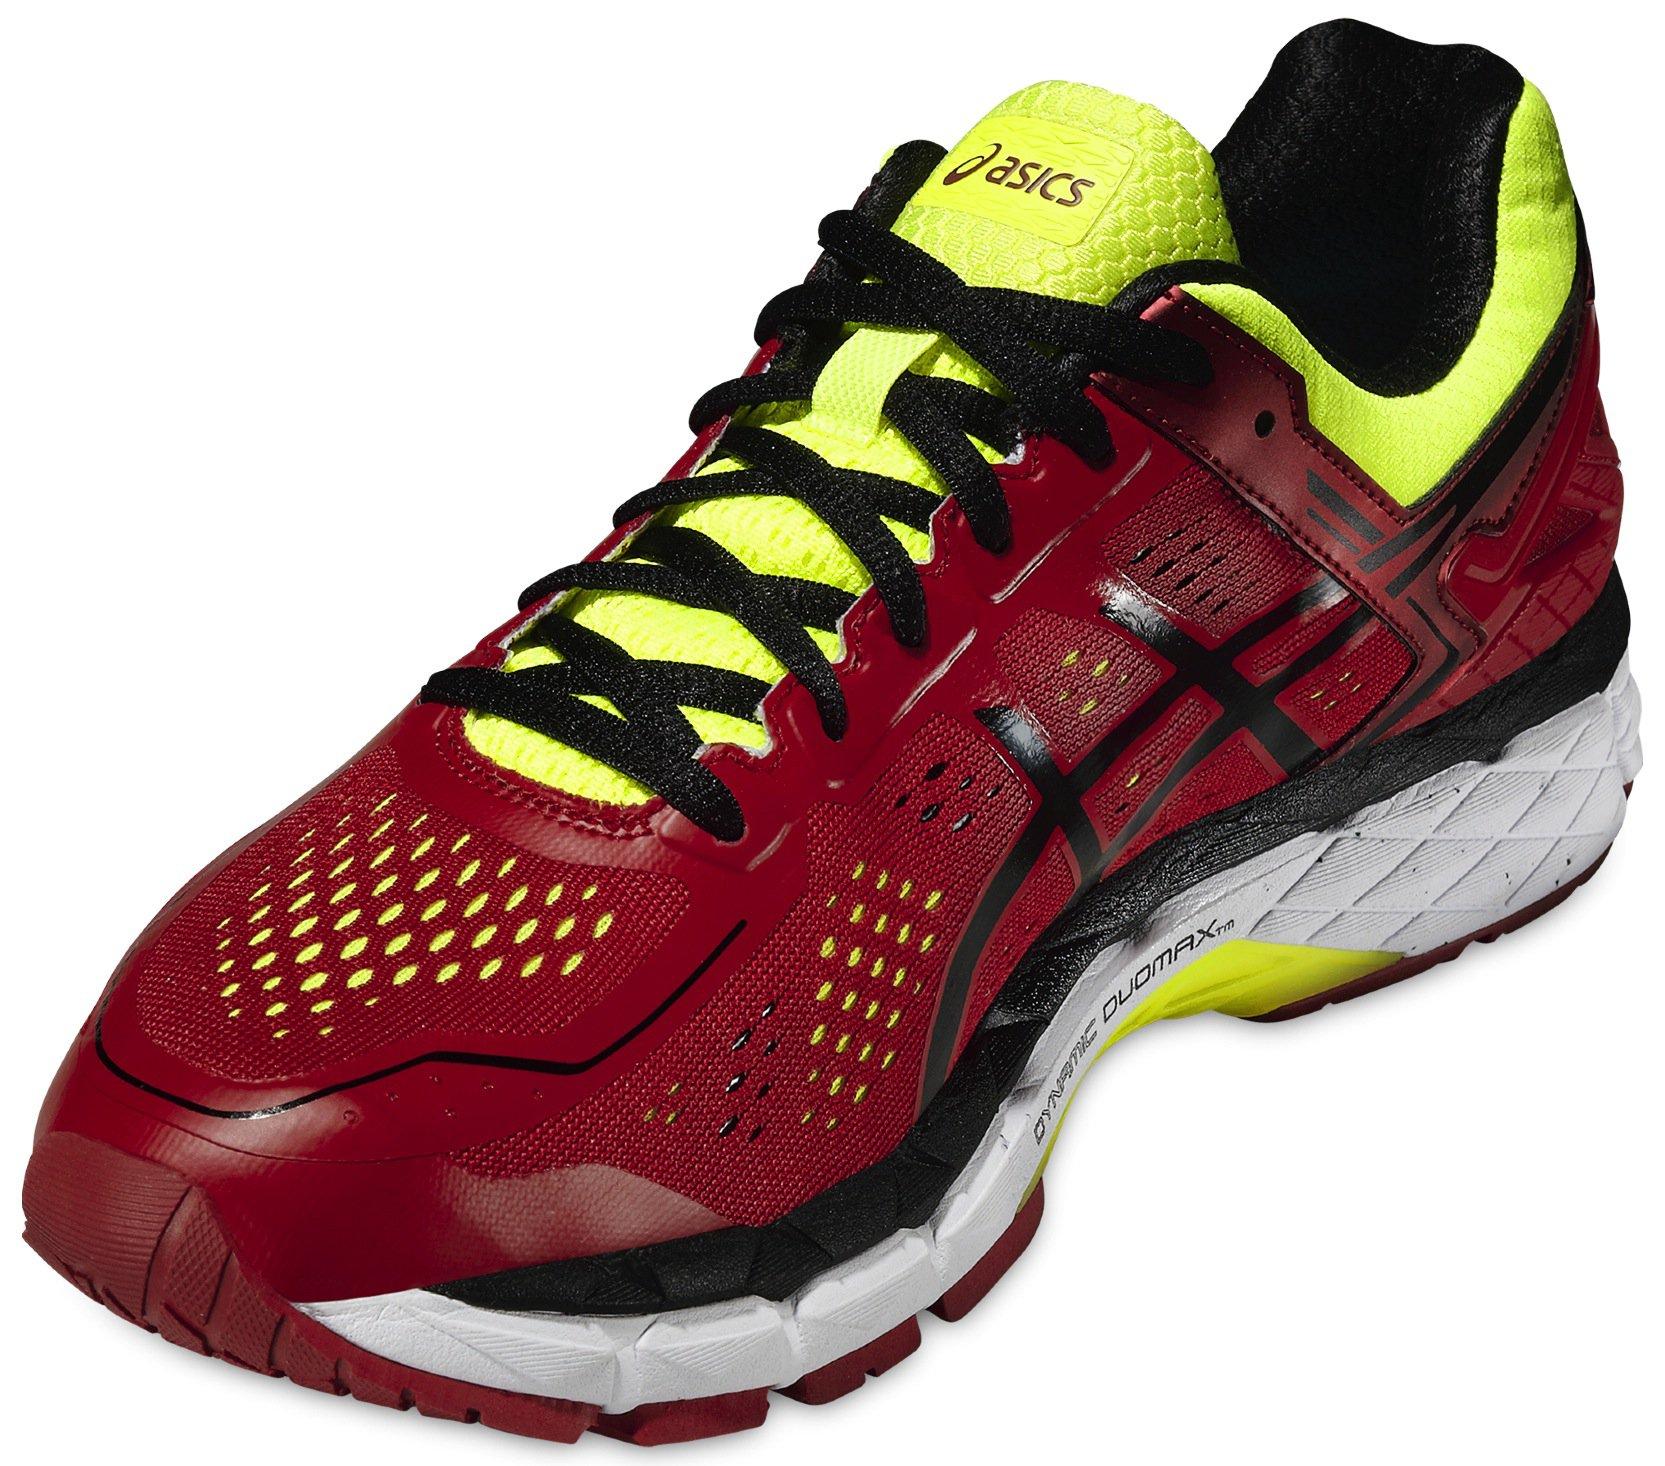 35f70420fc4e Купить кроссовки Asics Gel-Kayano 22 T547N 2490   Интернет-магазин ...